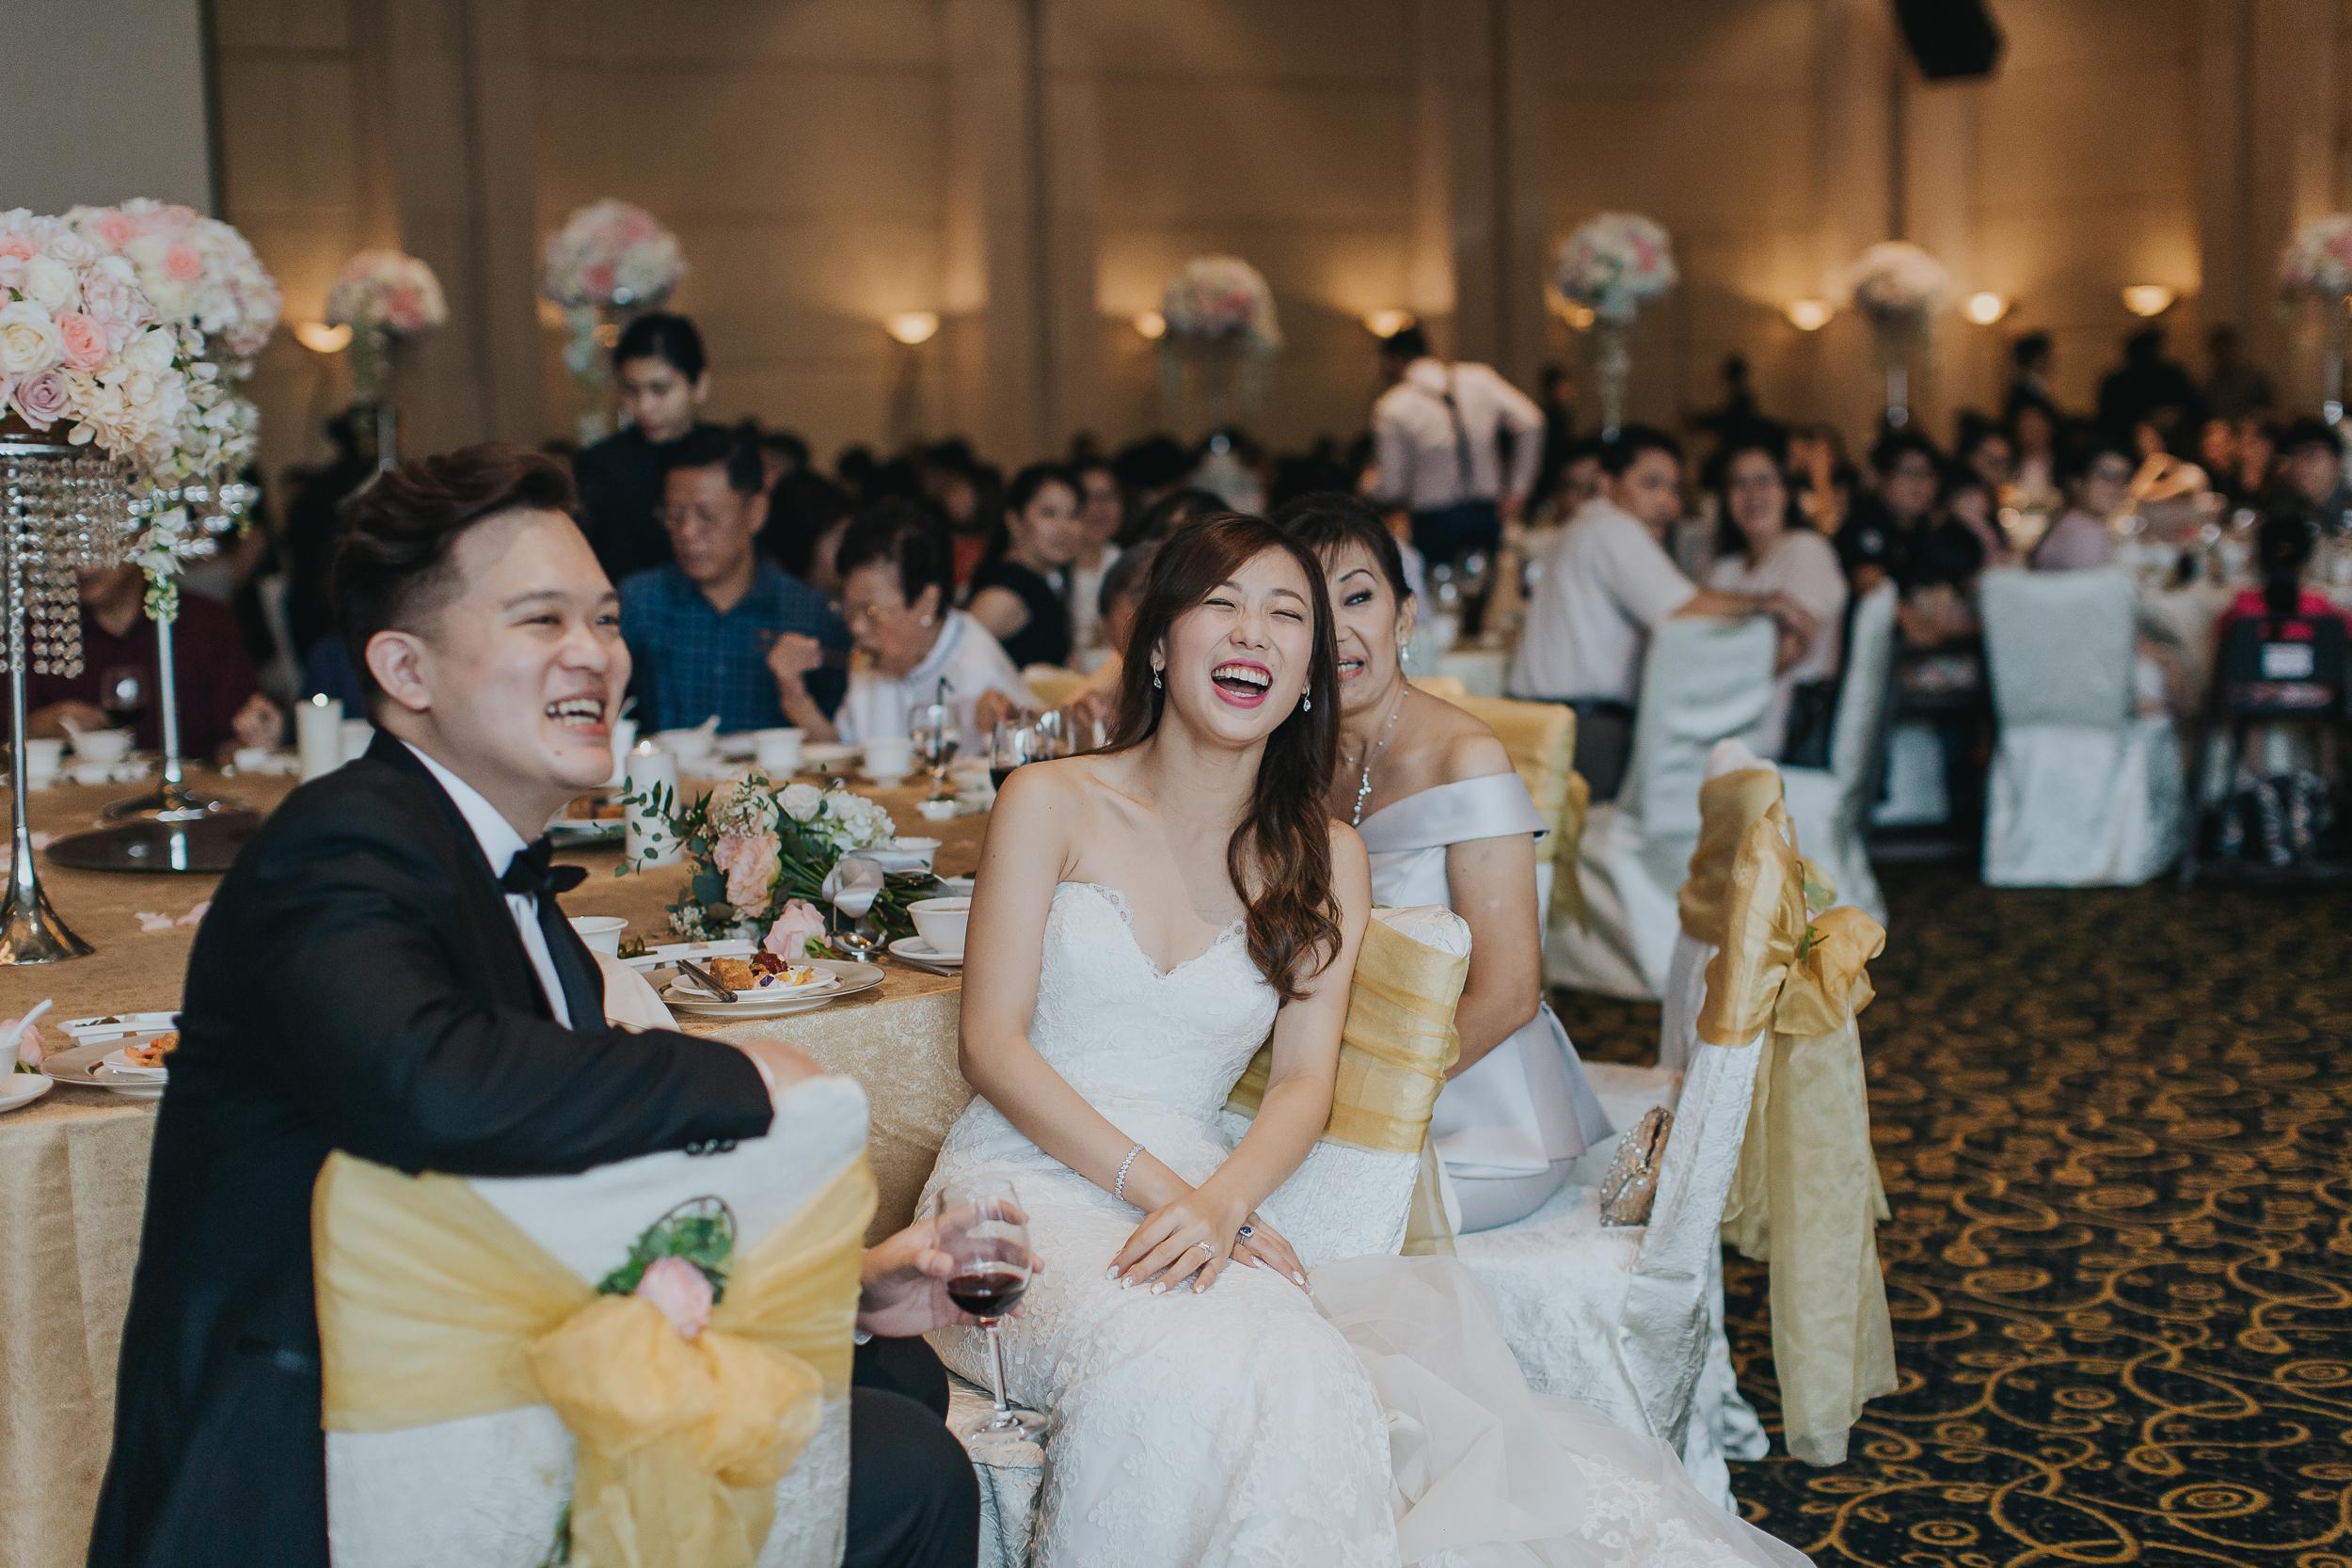 Singapore+Actual+Day+Wedding+Photographer+Grand+Mercure+Oliver+Estelle-0086.jpg